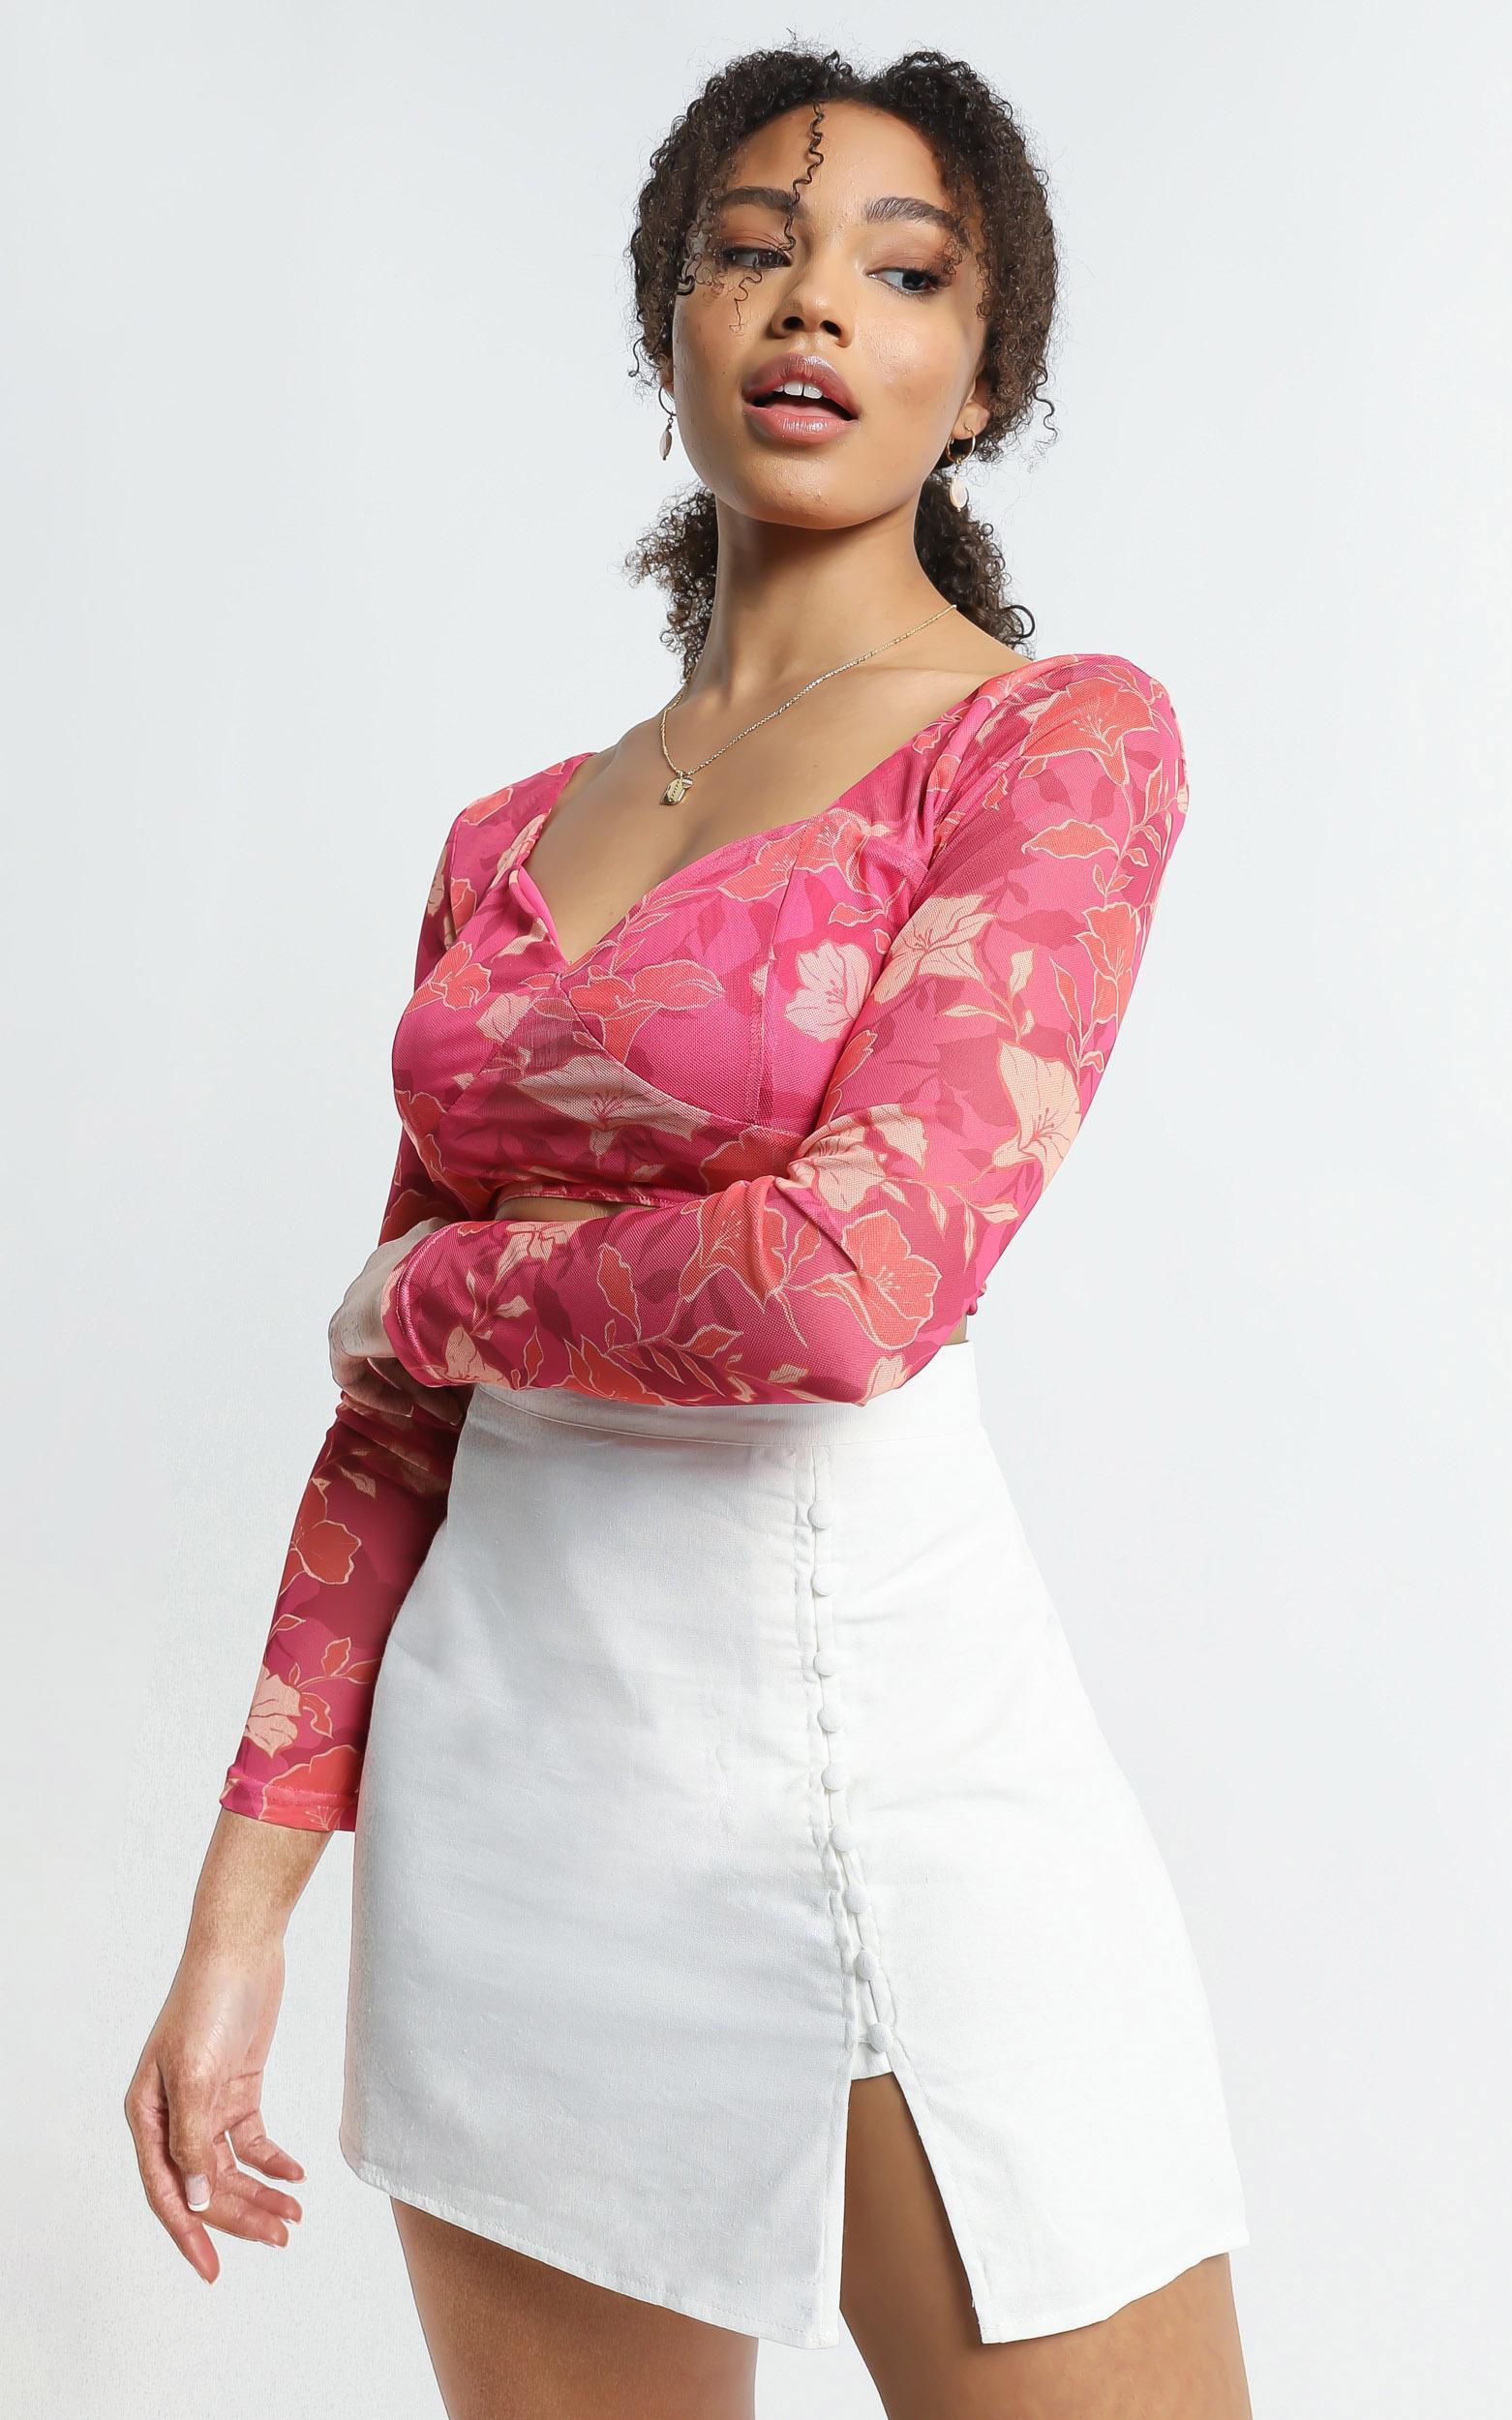 Zora Skirt in White - 6 (XS), White, hi-res image number null